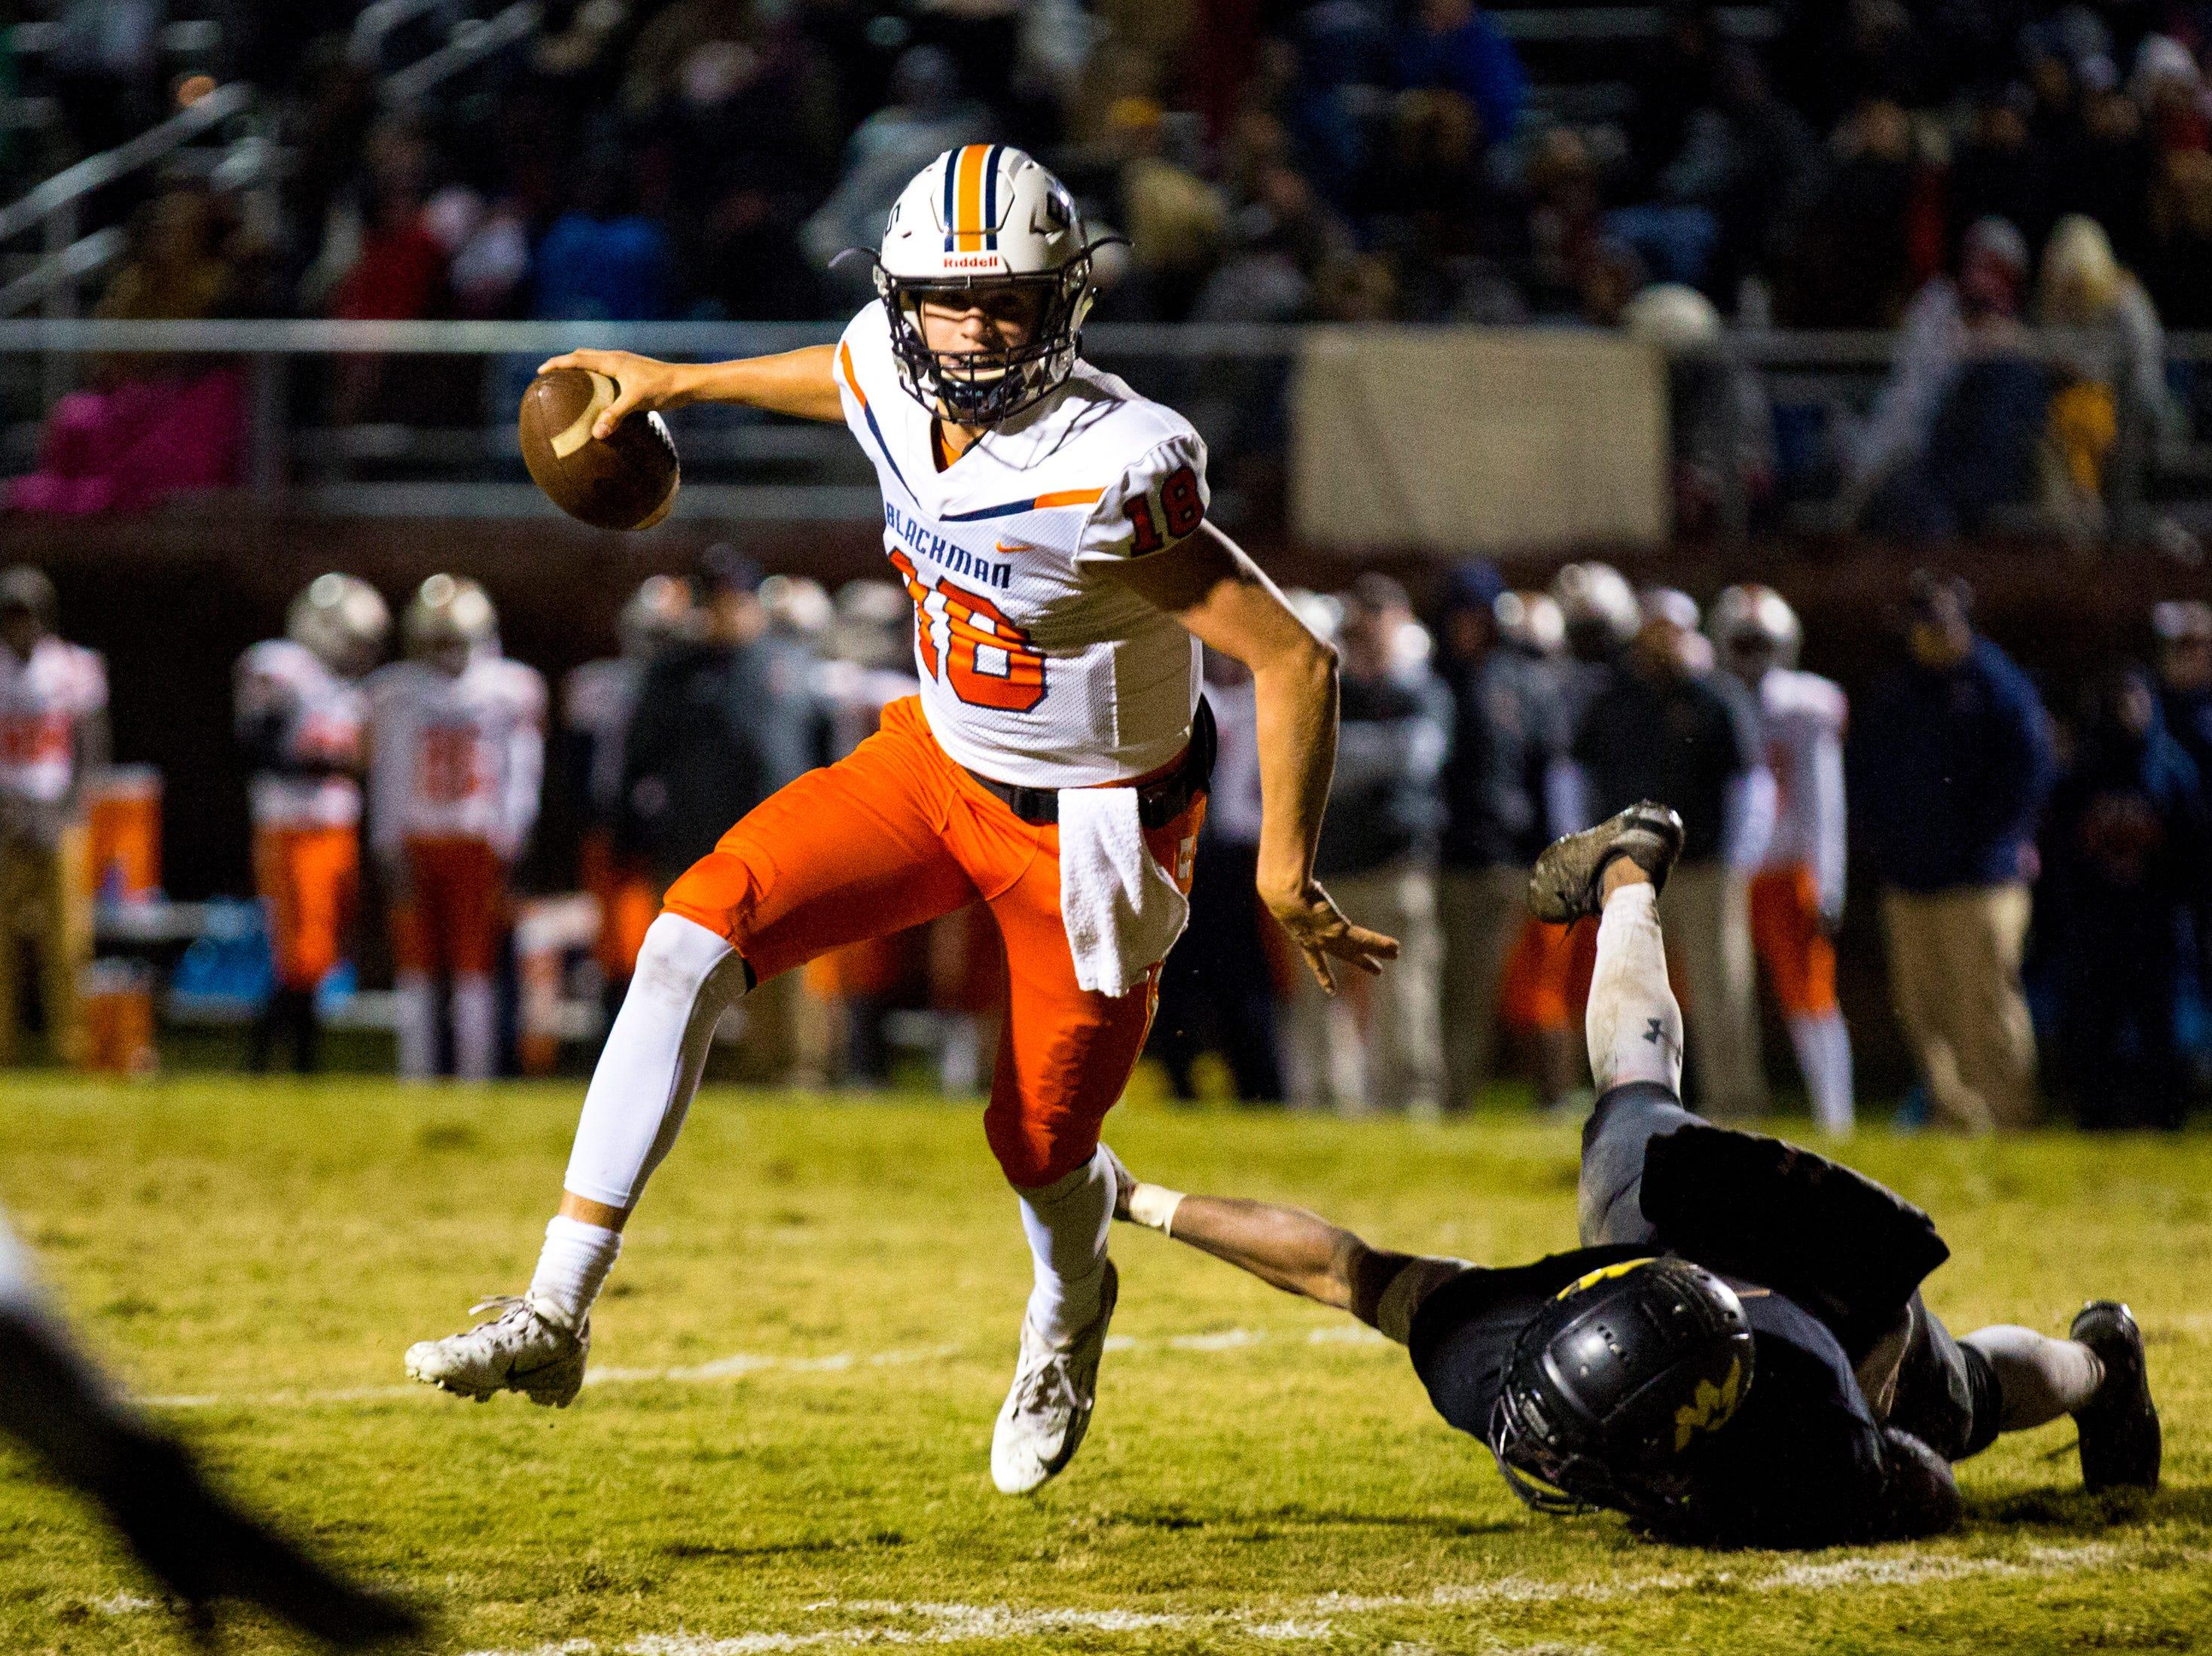 Blackman's Drew Beam (18) dodges a tackle during Mt. Juliet's game against Blackman at Mt. Juliet High School in Mt. Juliet on Friday, Nov. 9, 2018.